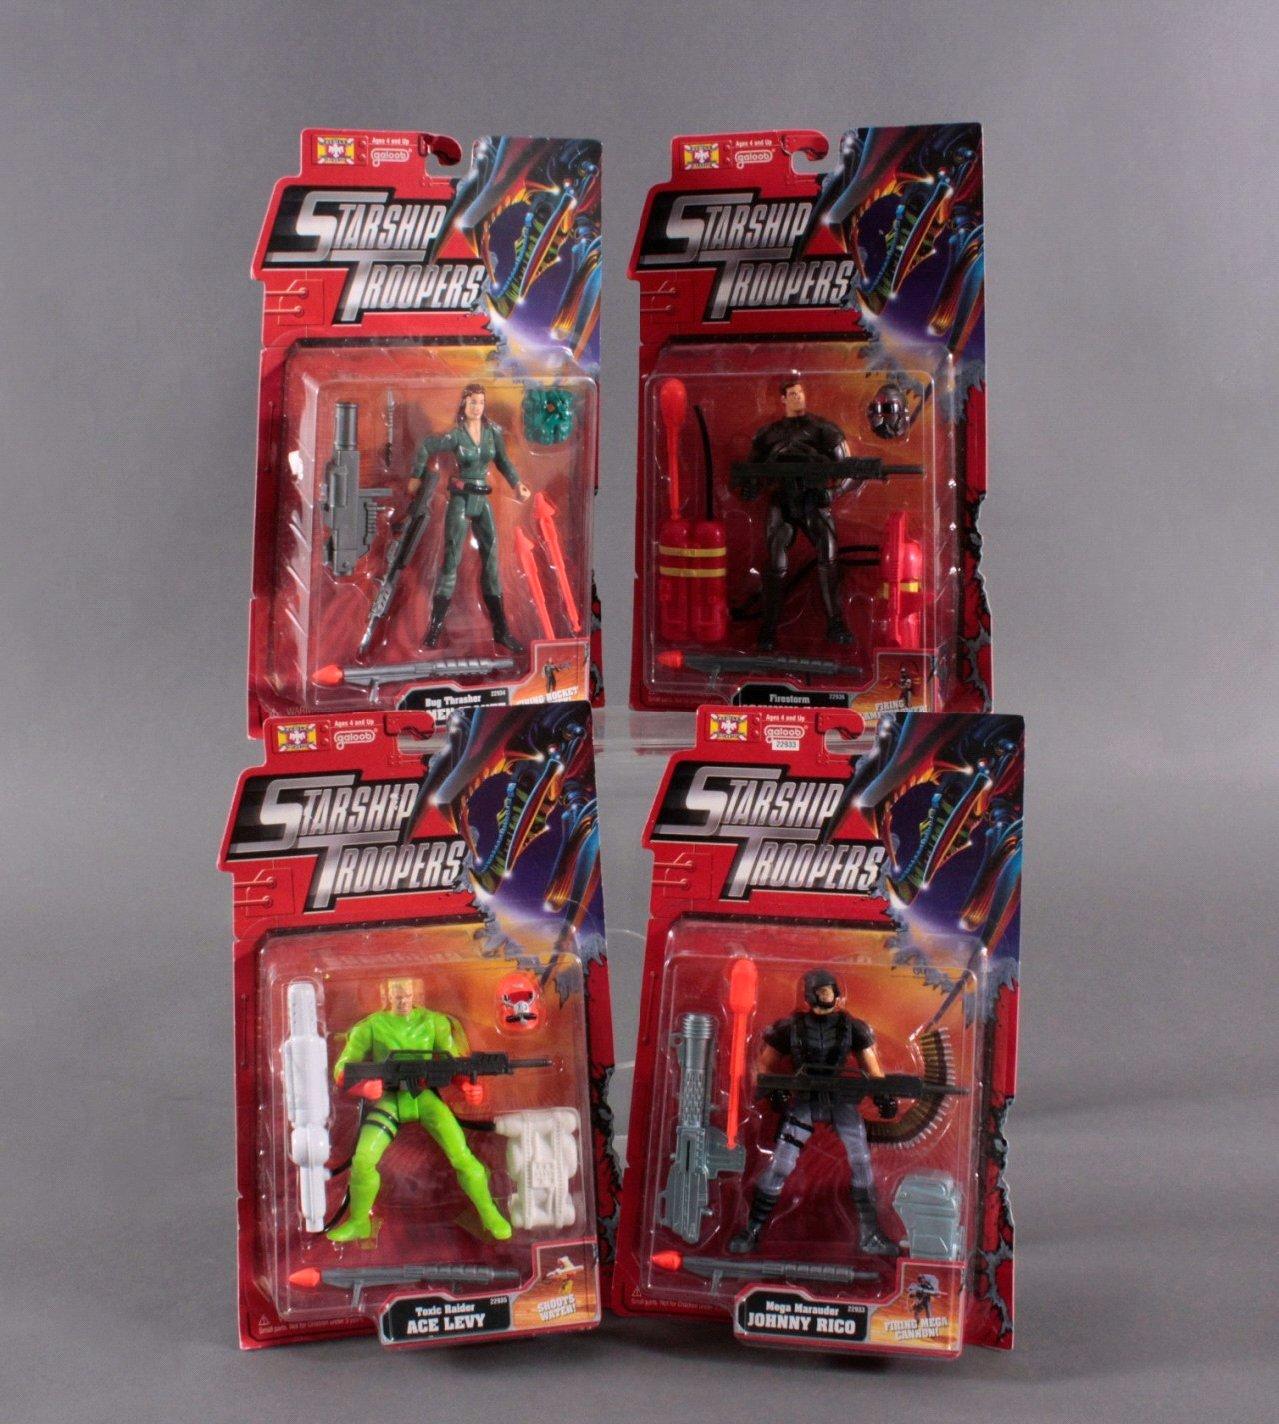 Starship Troopers Action Figuren 4 Stück